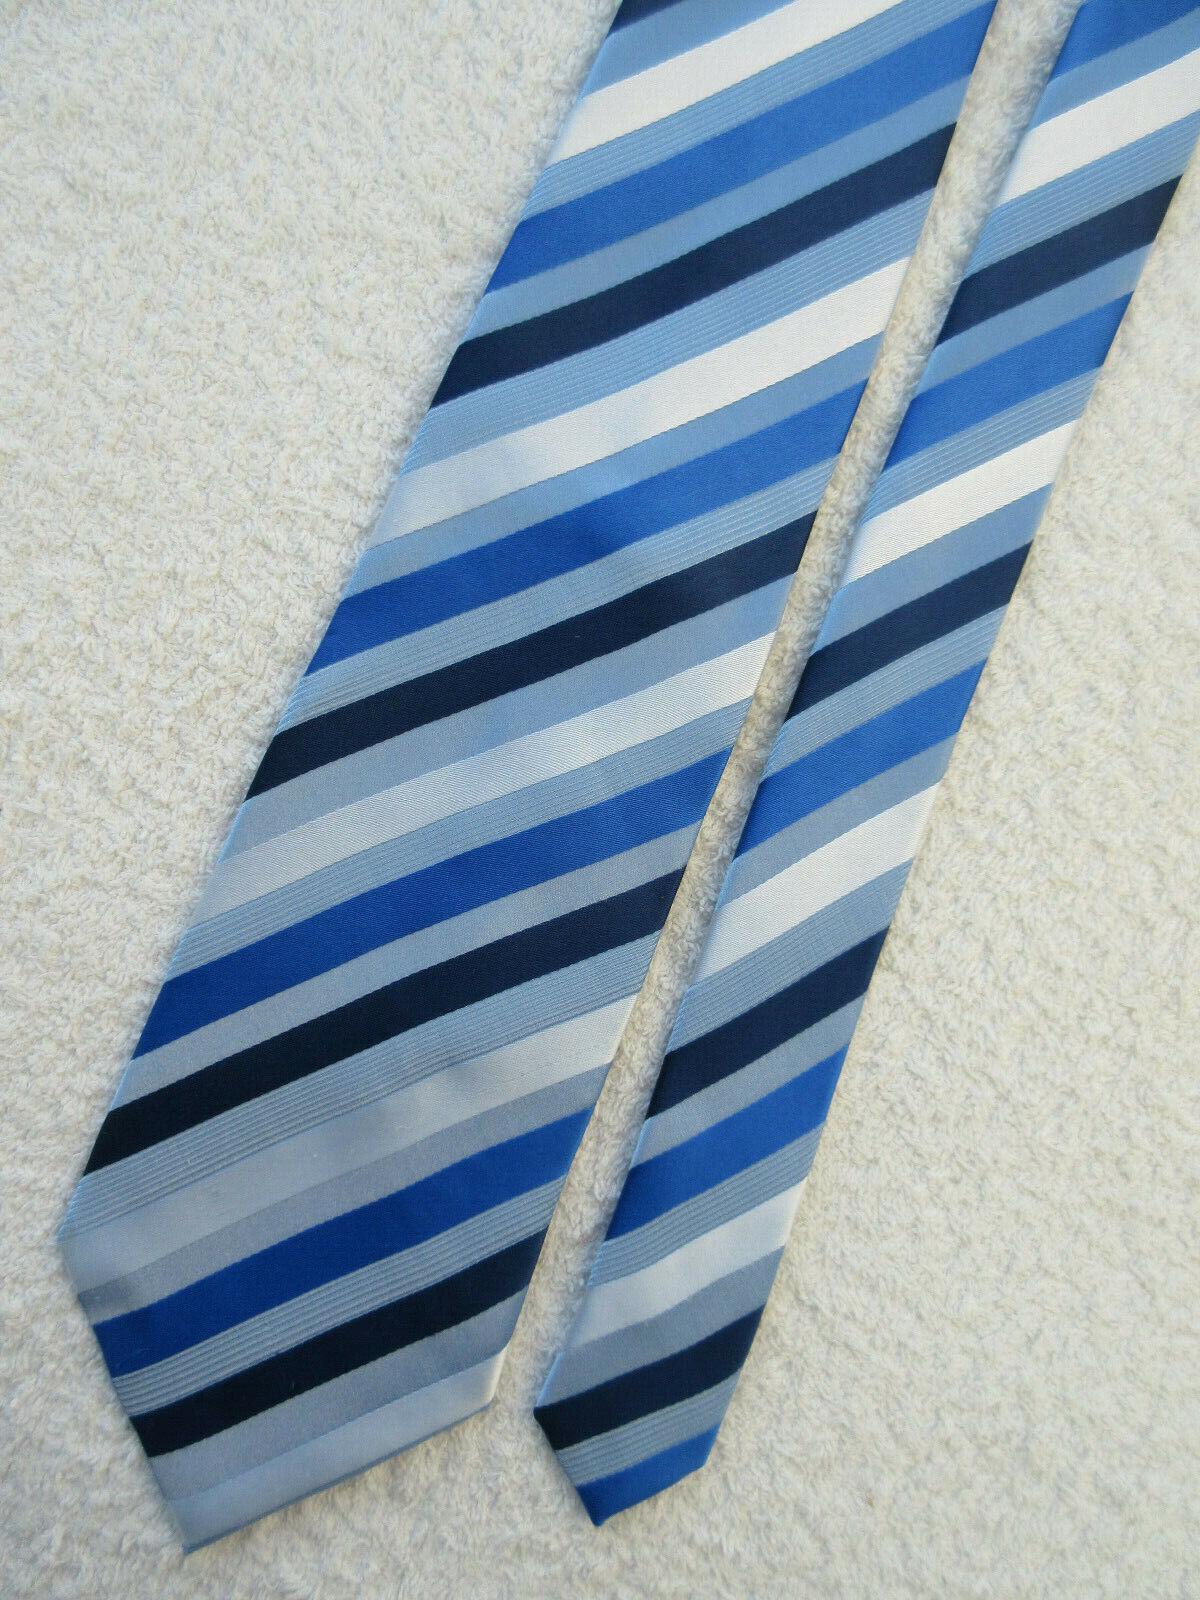 BLUE WHITE STRIPED 4 inch polyester necktie TIE by GEORGE